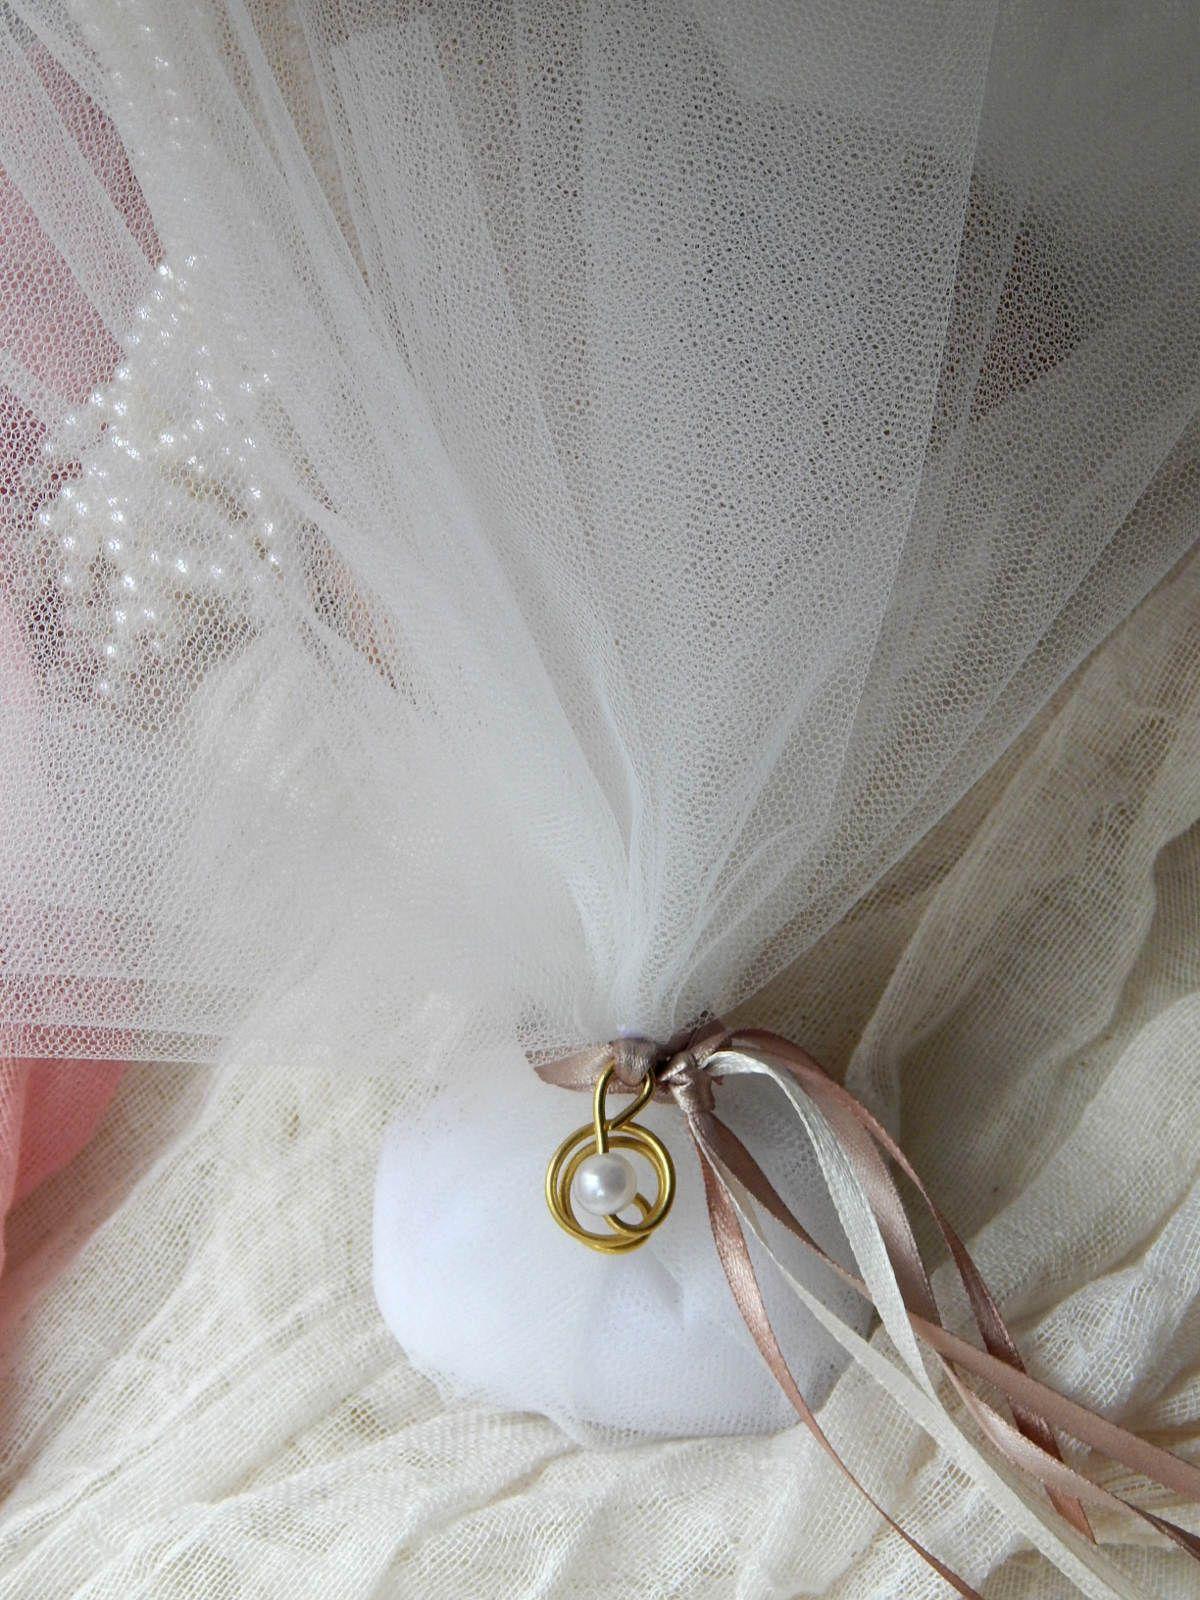 8cb2c8ba967a Κλασική μπομπονιέρα γάμου - τούλι και μεταλλικό στοιχείο με πέρλα   mpomponieres  bomboniere  wedding  πέρλες  γάμος  τούλι